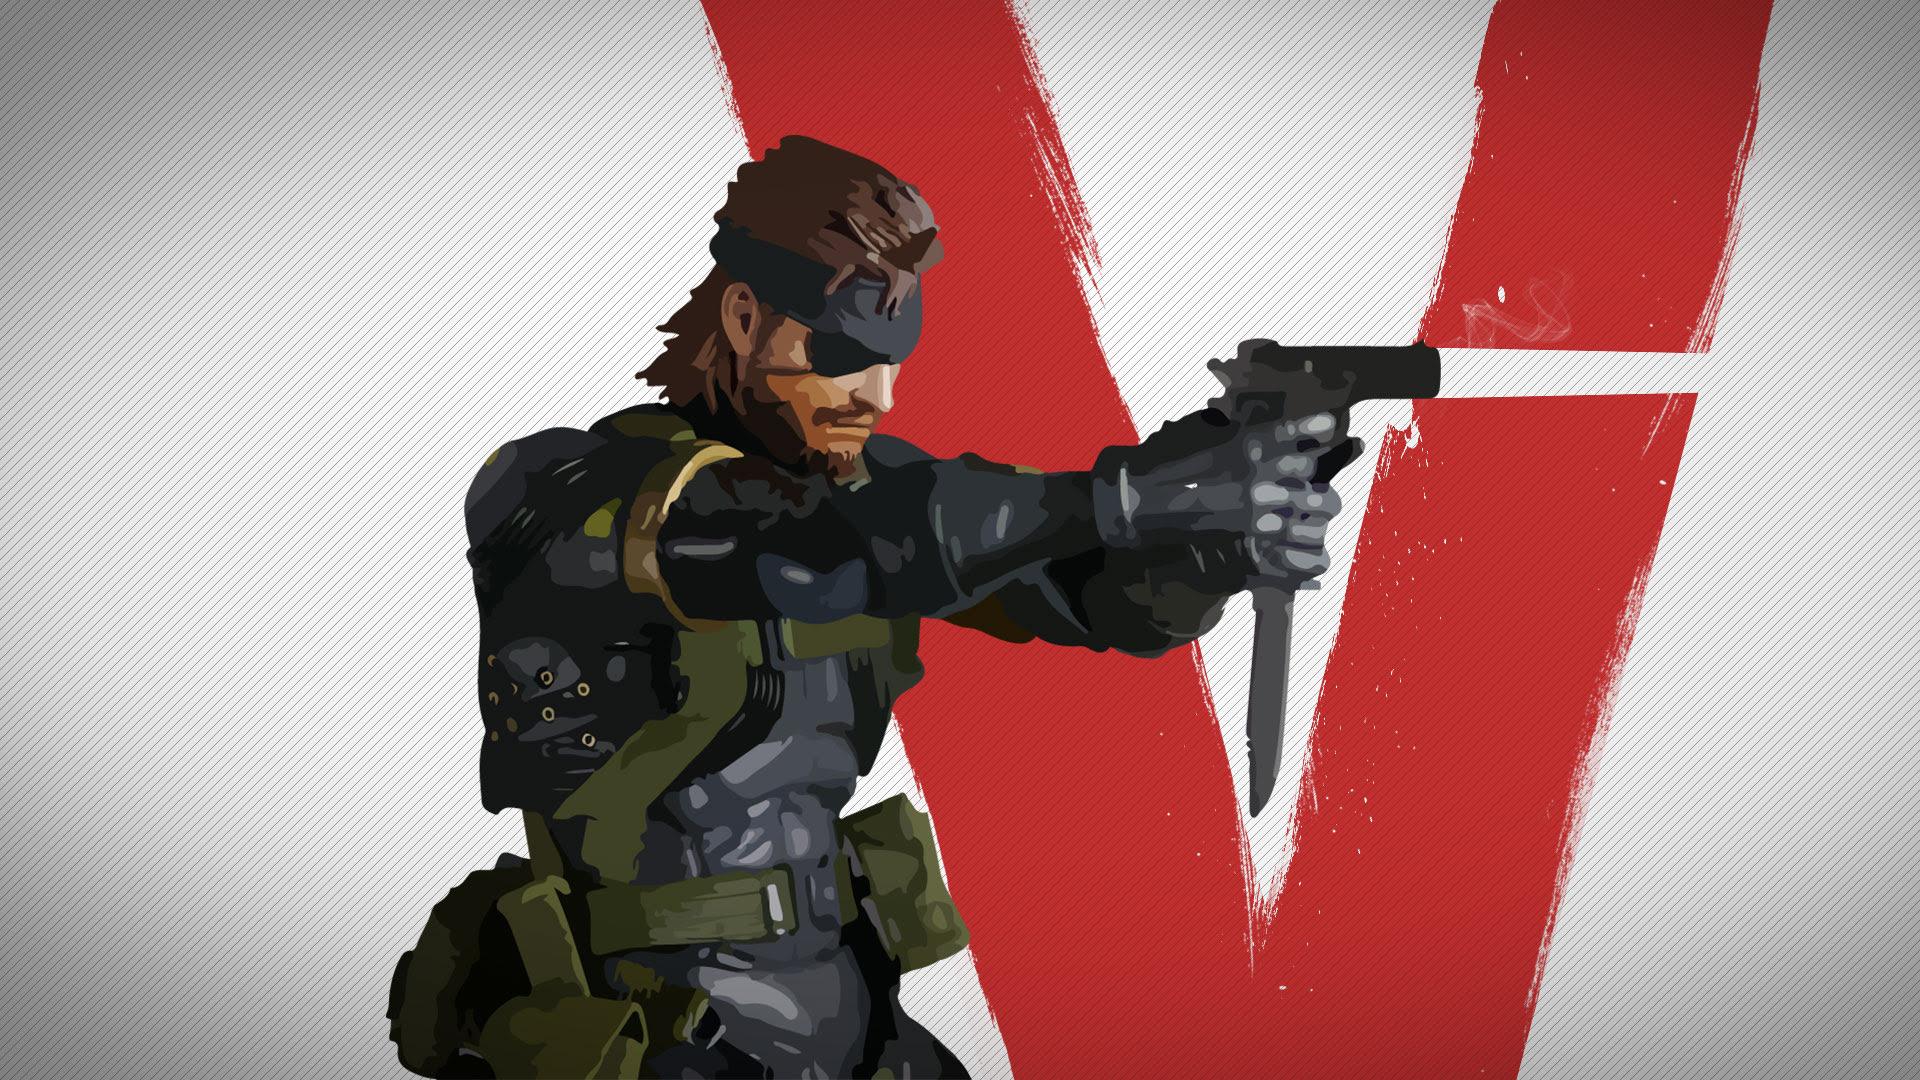 Metal Gear Solid 5 Big Boss Wallpapers Benjamin Stratton